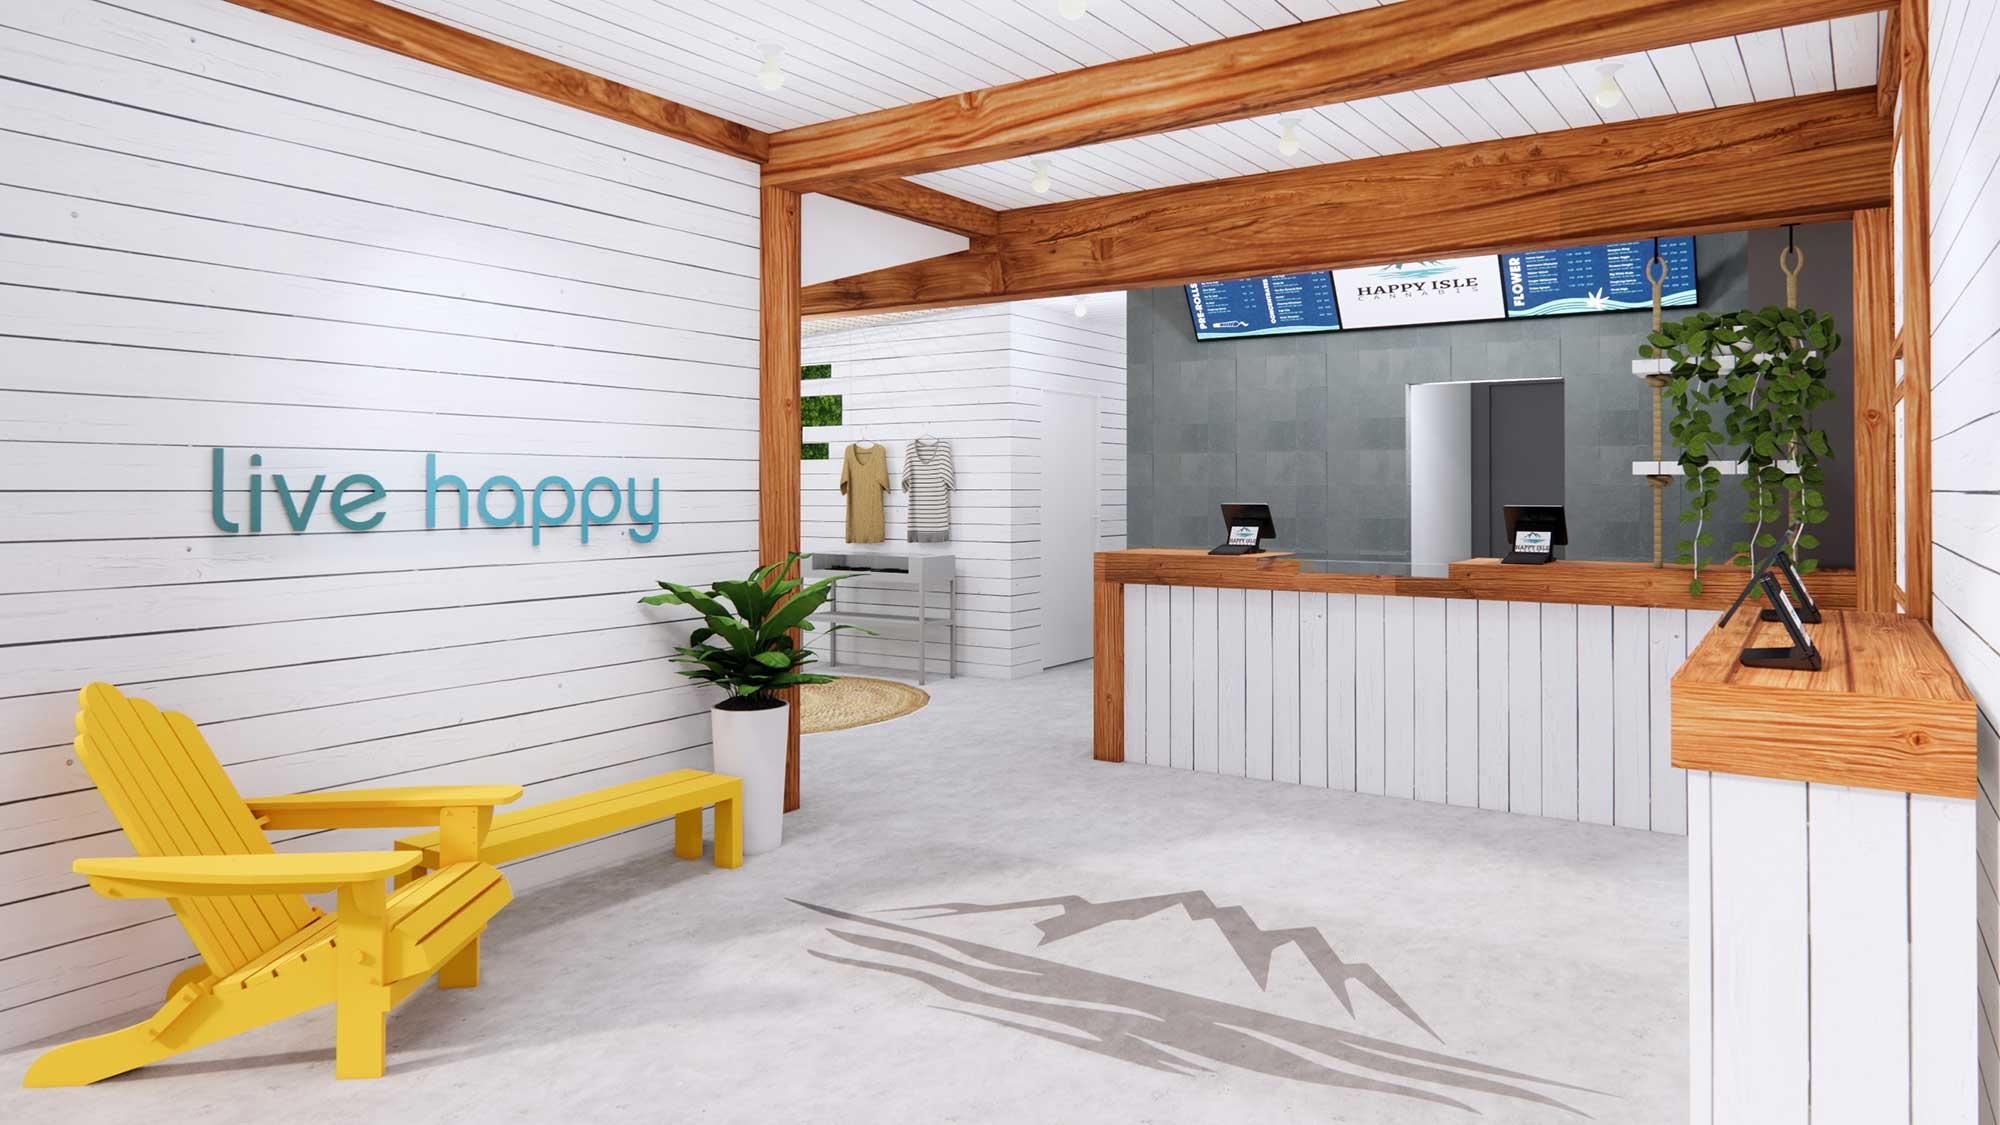 Happy-Isle-Interior-Cash-Desk